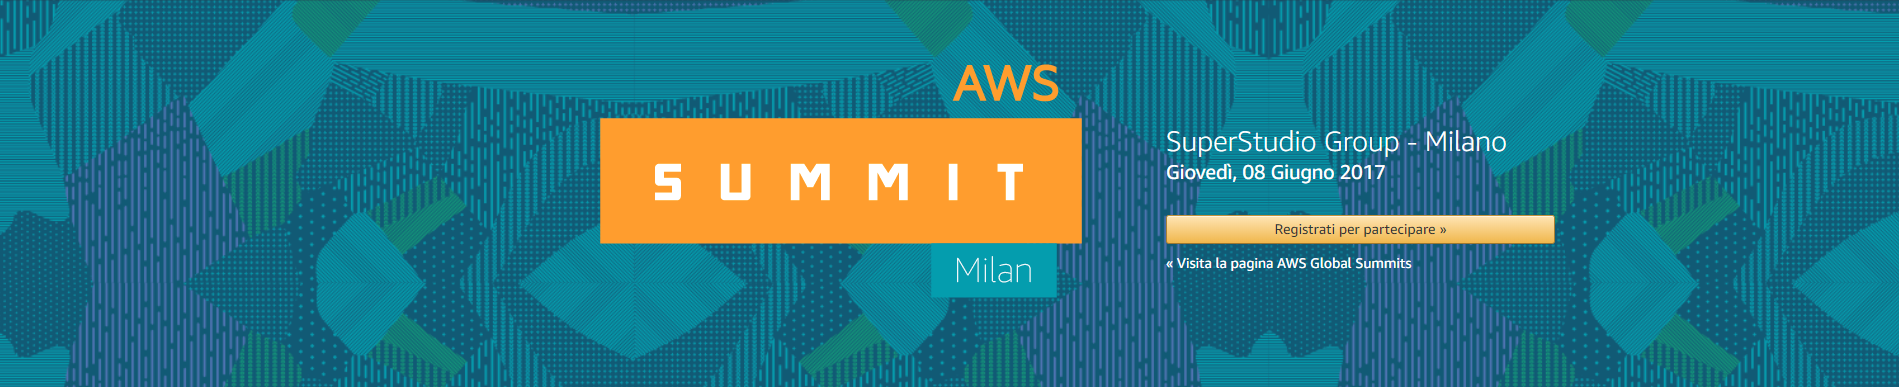 Amazon AWS Summit 2017